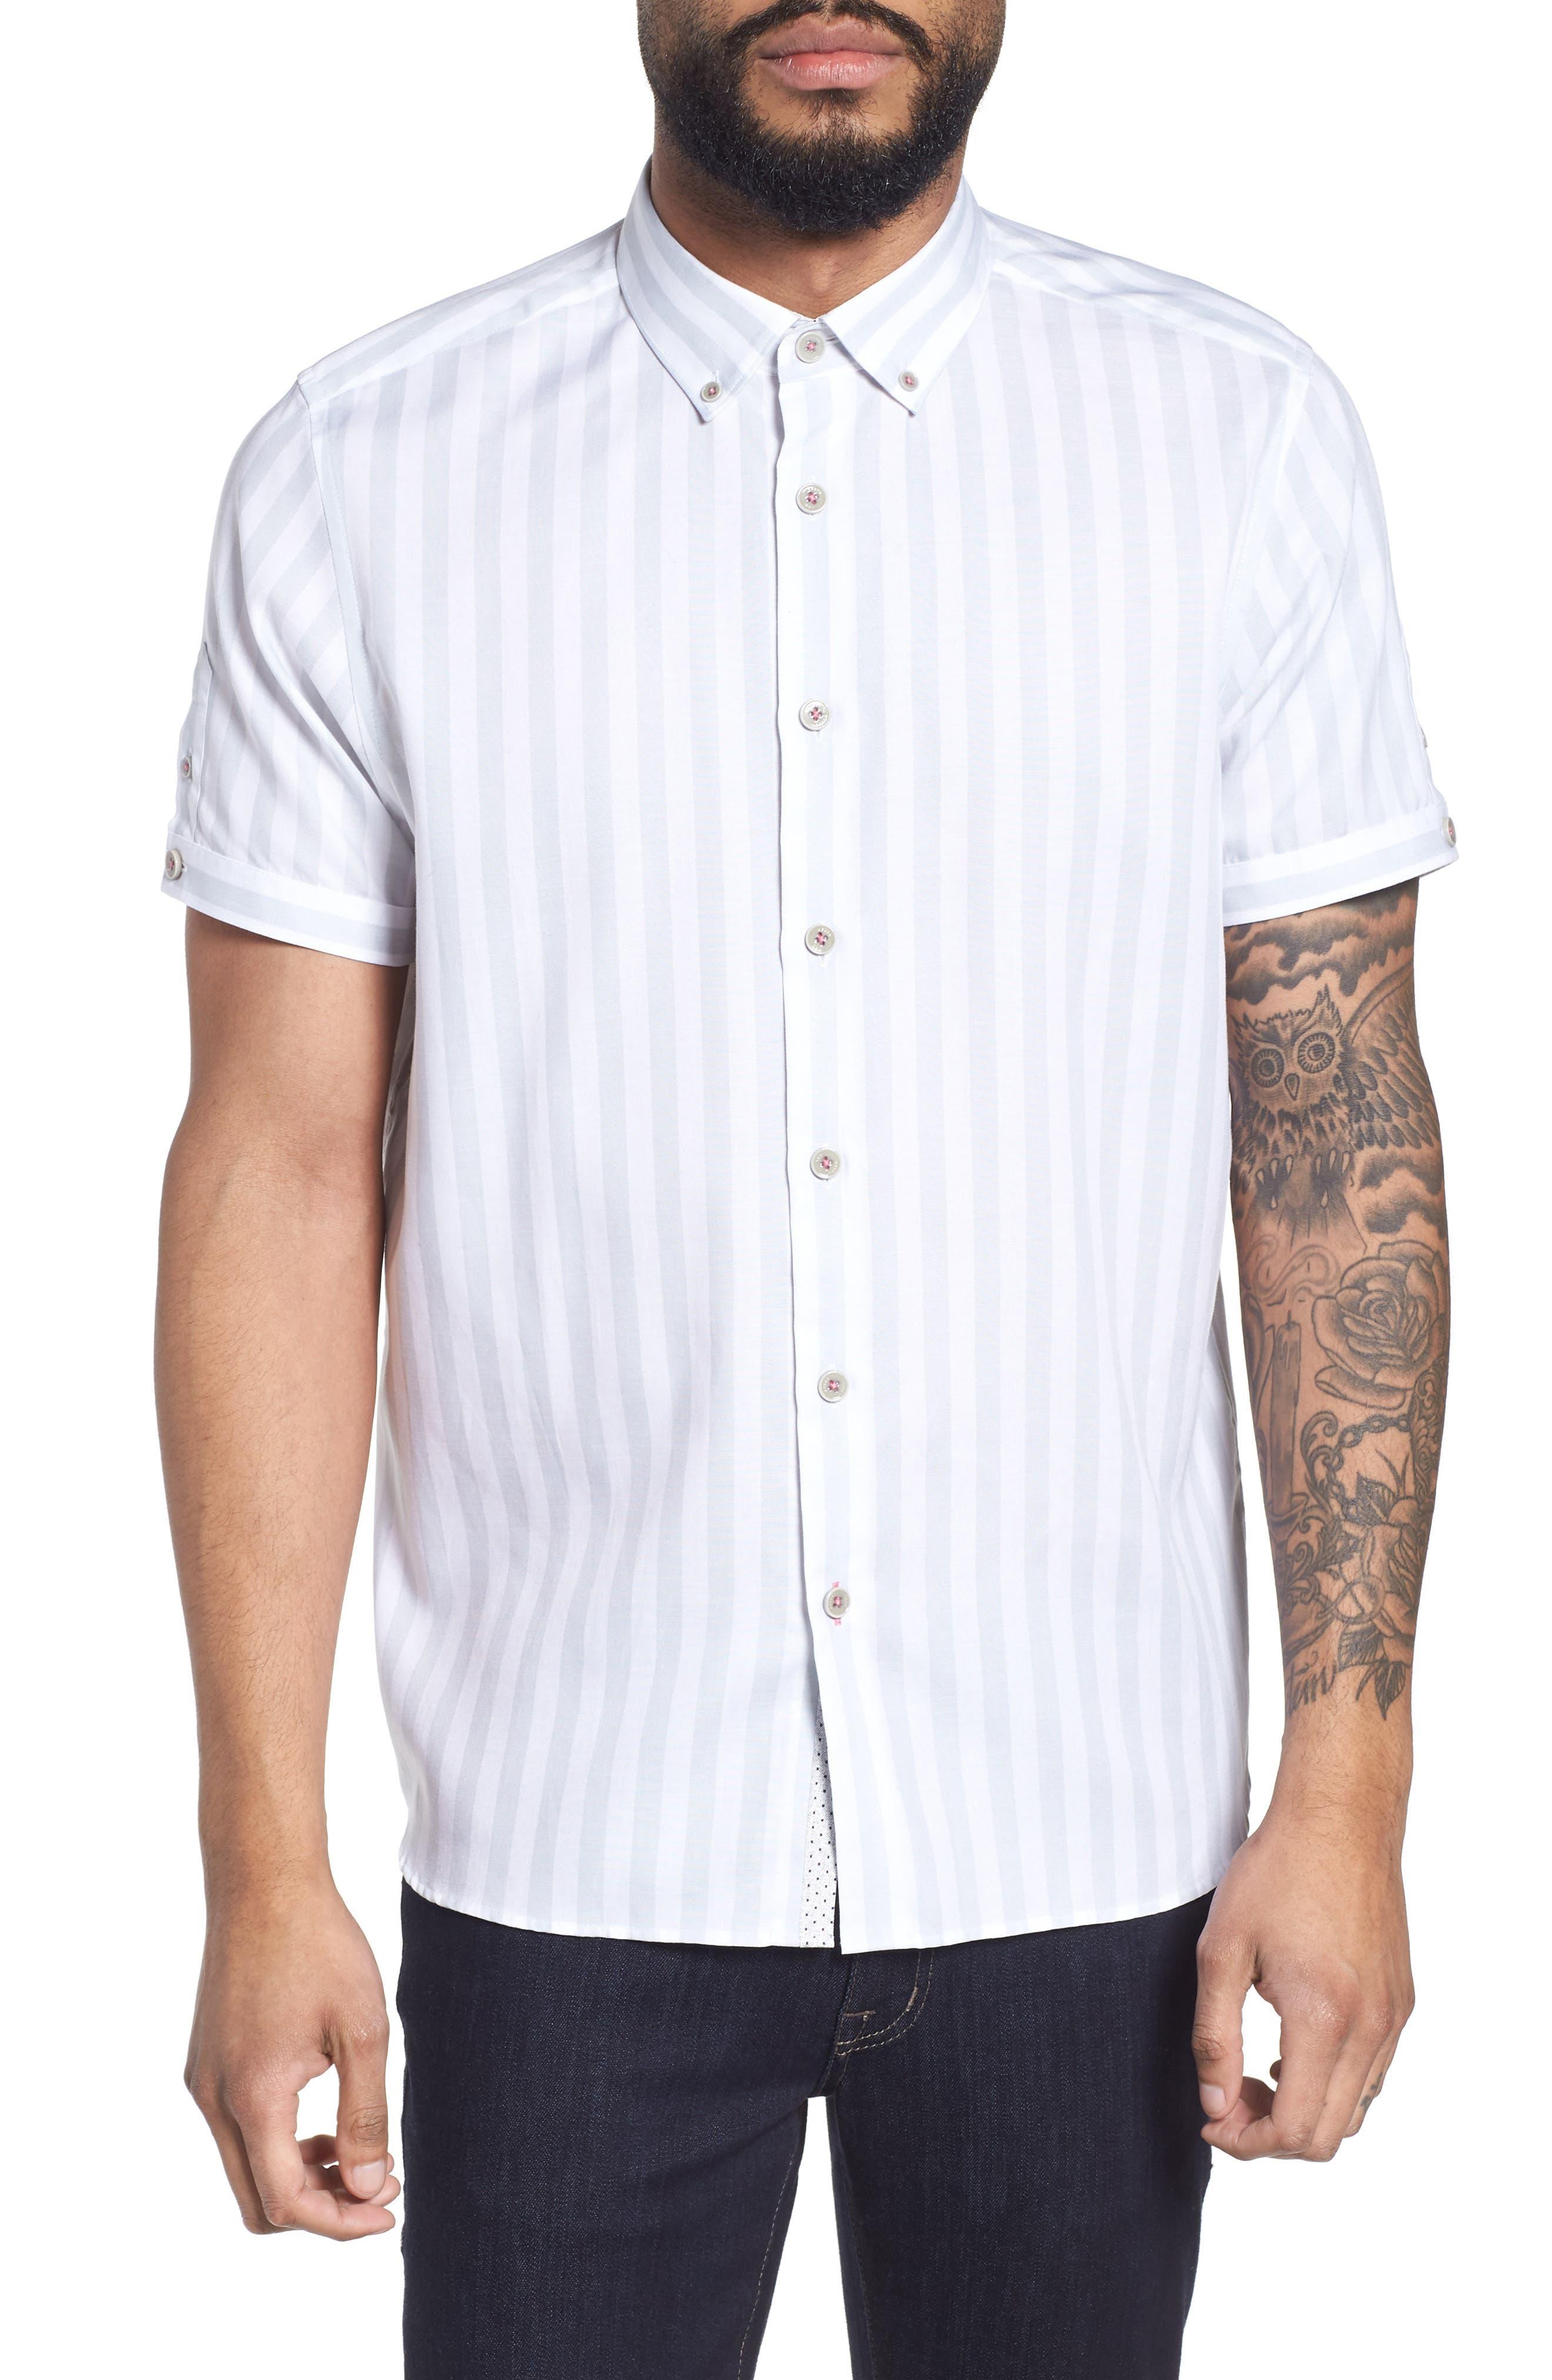 TED BAKER LONDON,                             Vertical Stripe Trim Fit Short Sleeve Sport Shirt,                             Main thumbnail 1, color,                             311